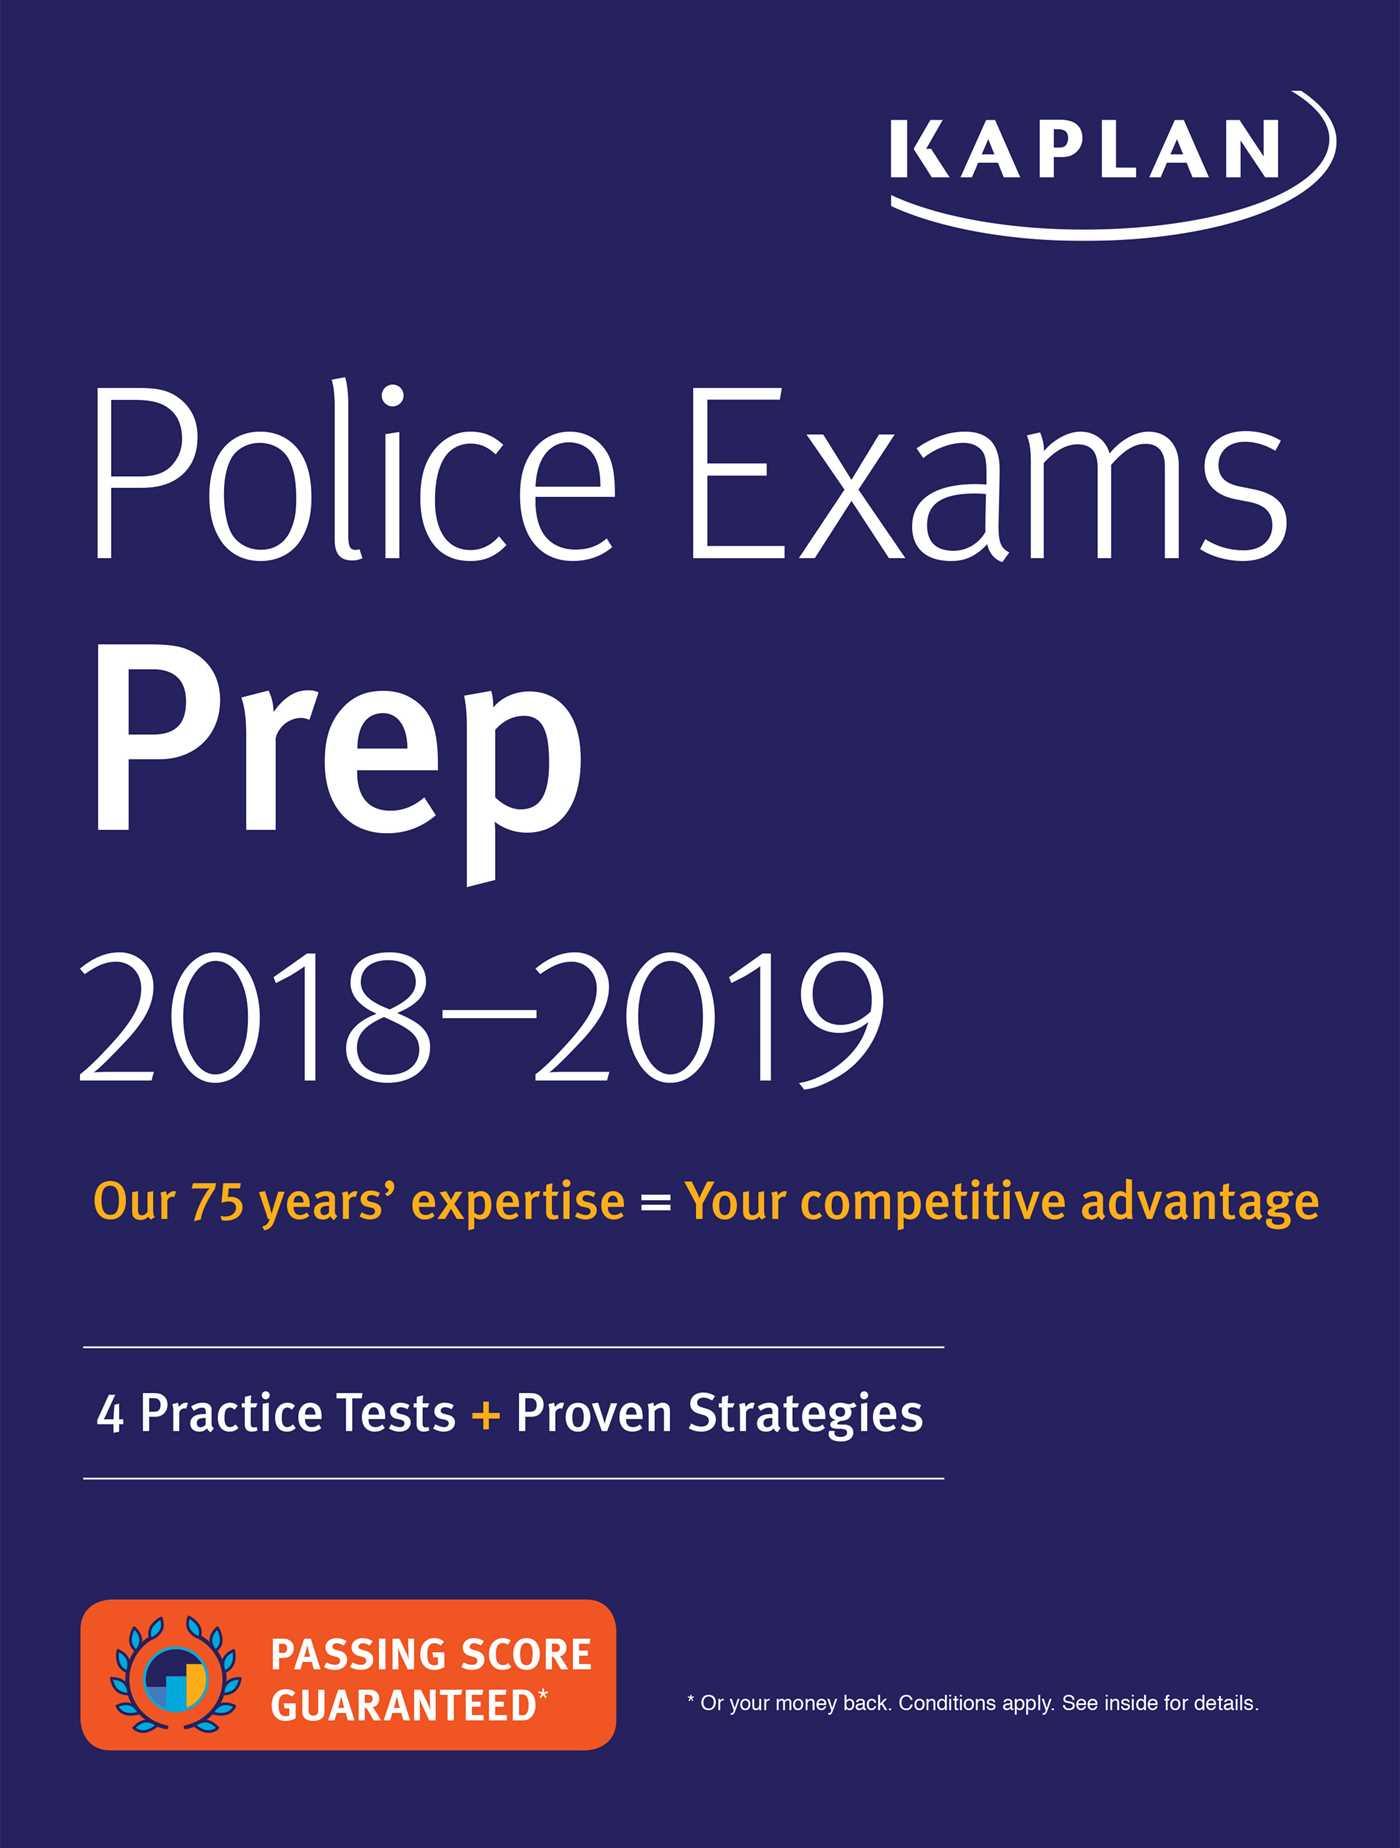 Book Cover Image (jpg): Police Exams Prep 2018-2019